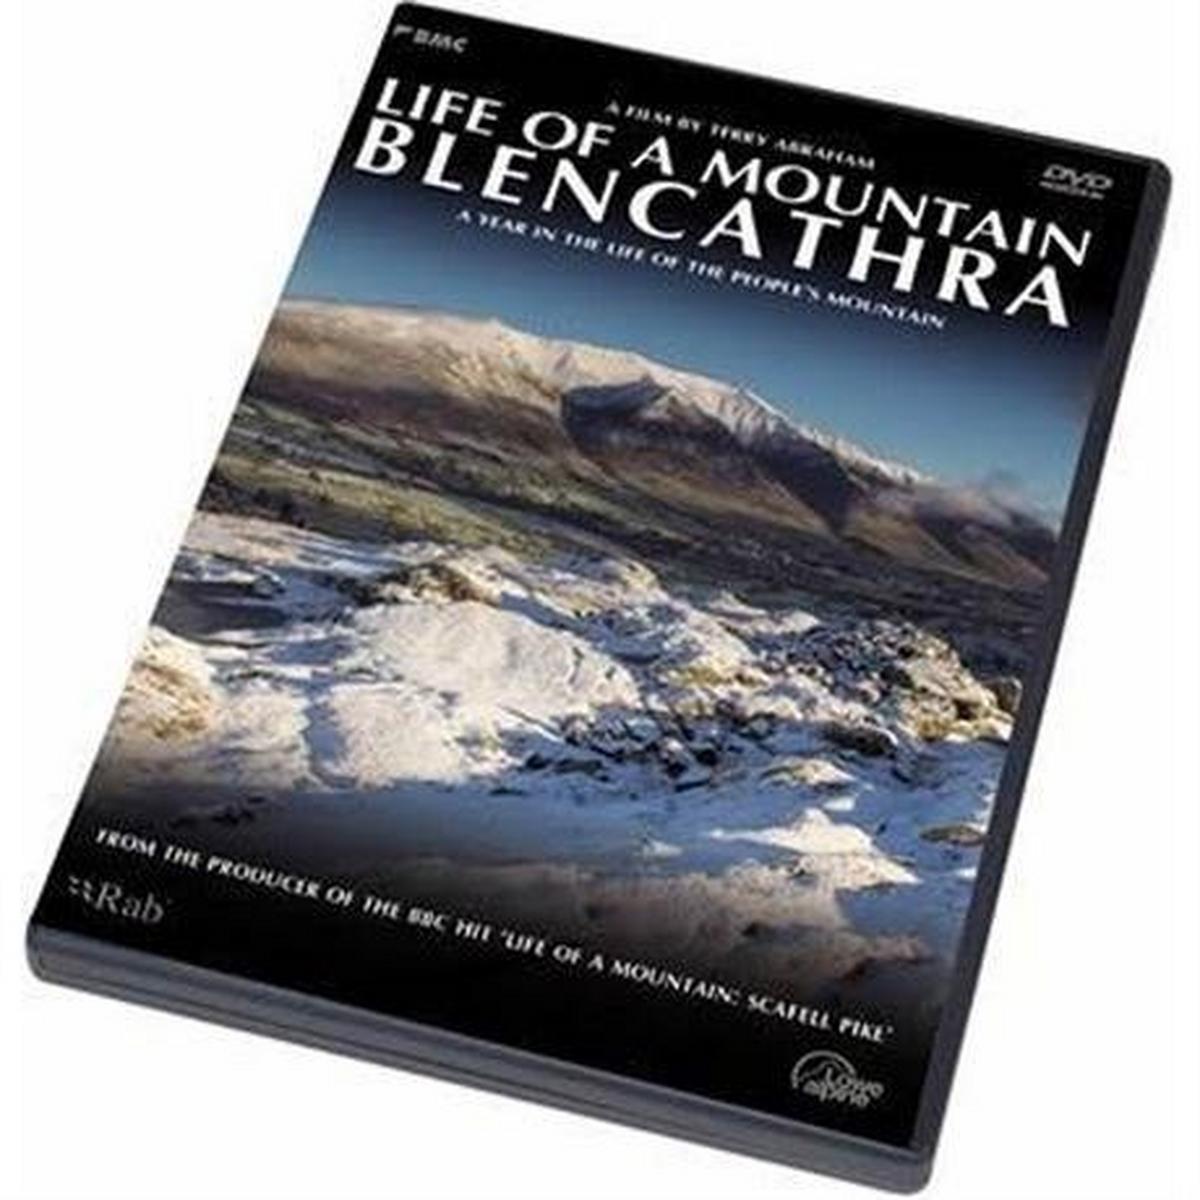 Miscellaneous DVD: Life of a Mountain - Blencathra - Terry Abraham